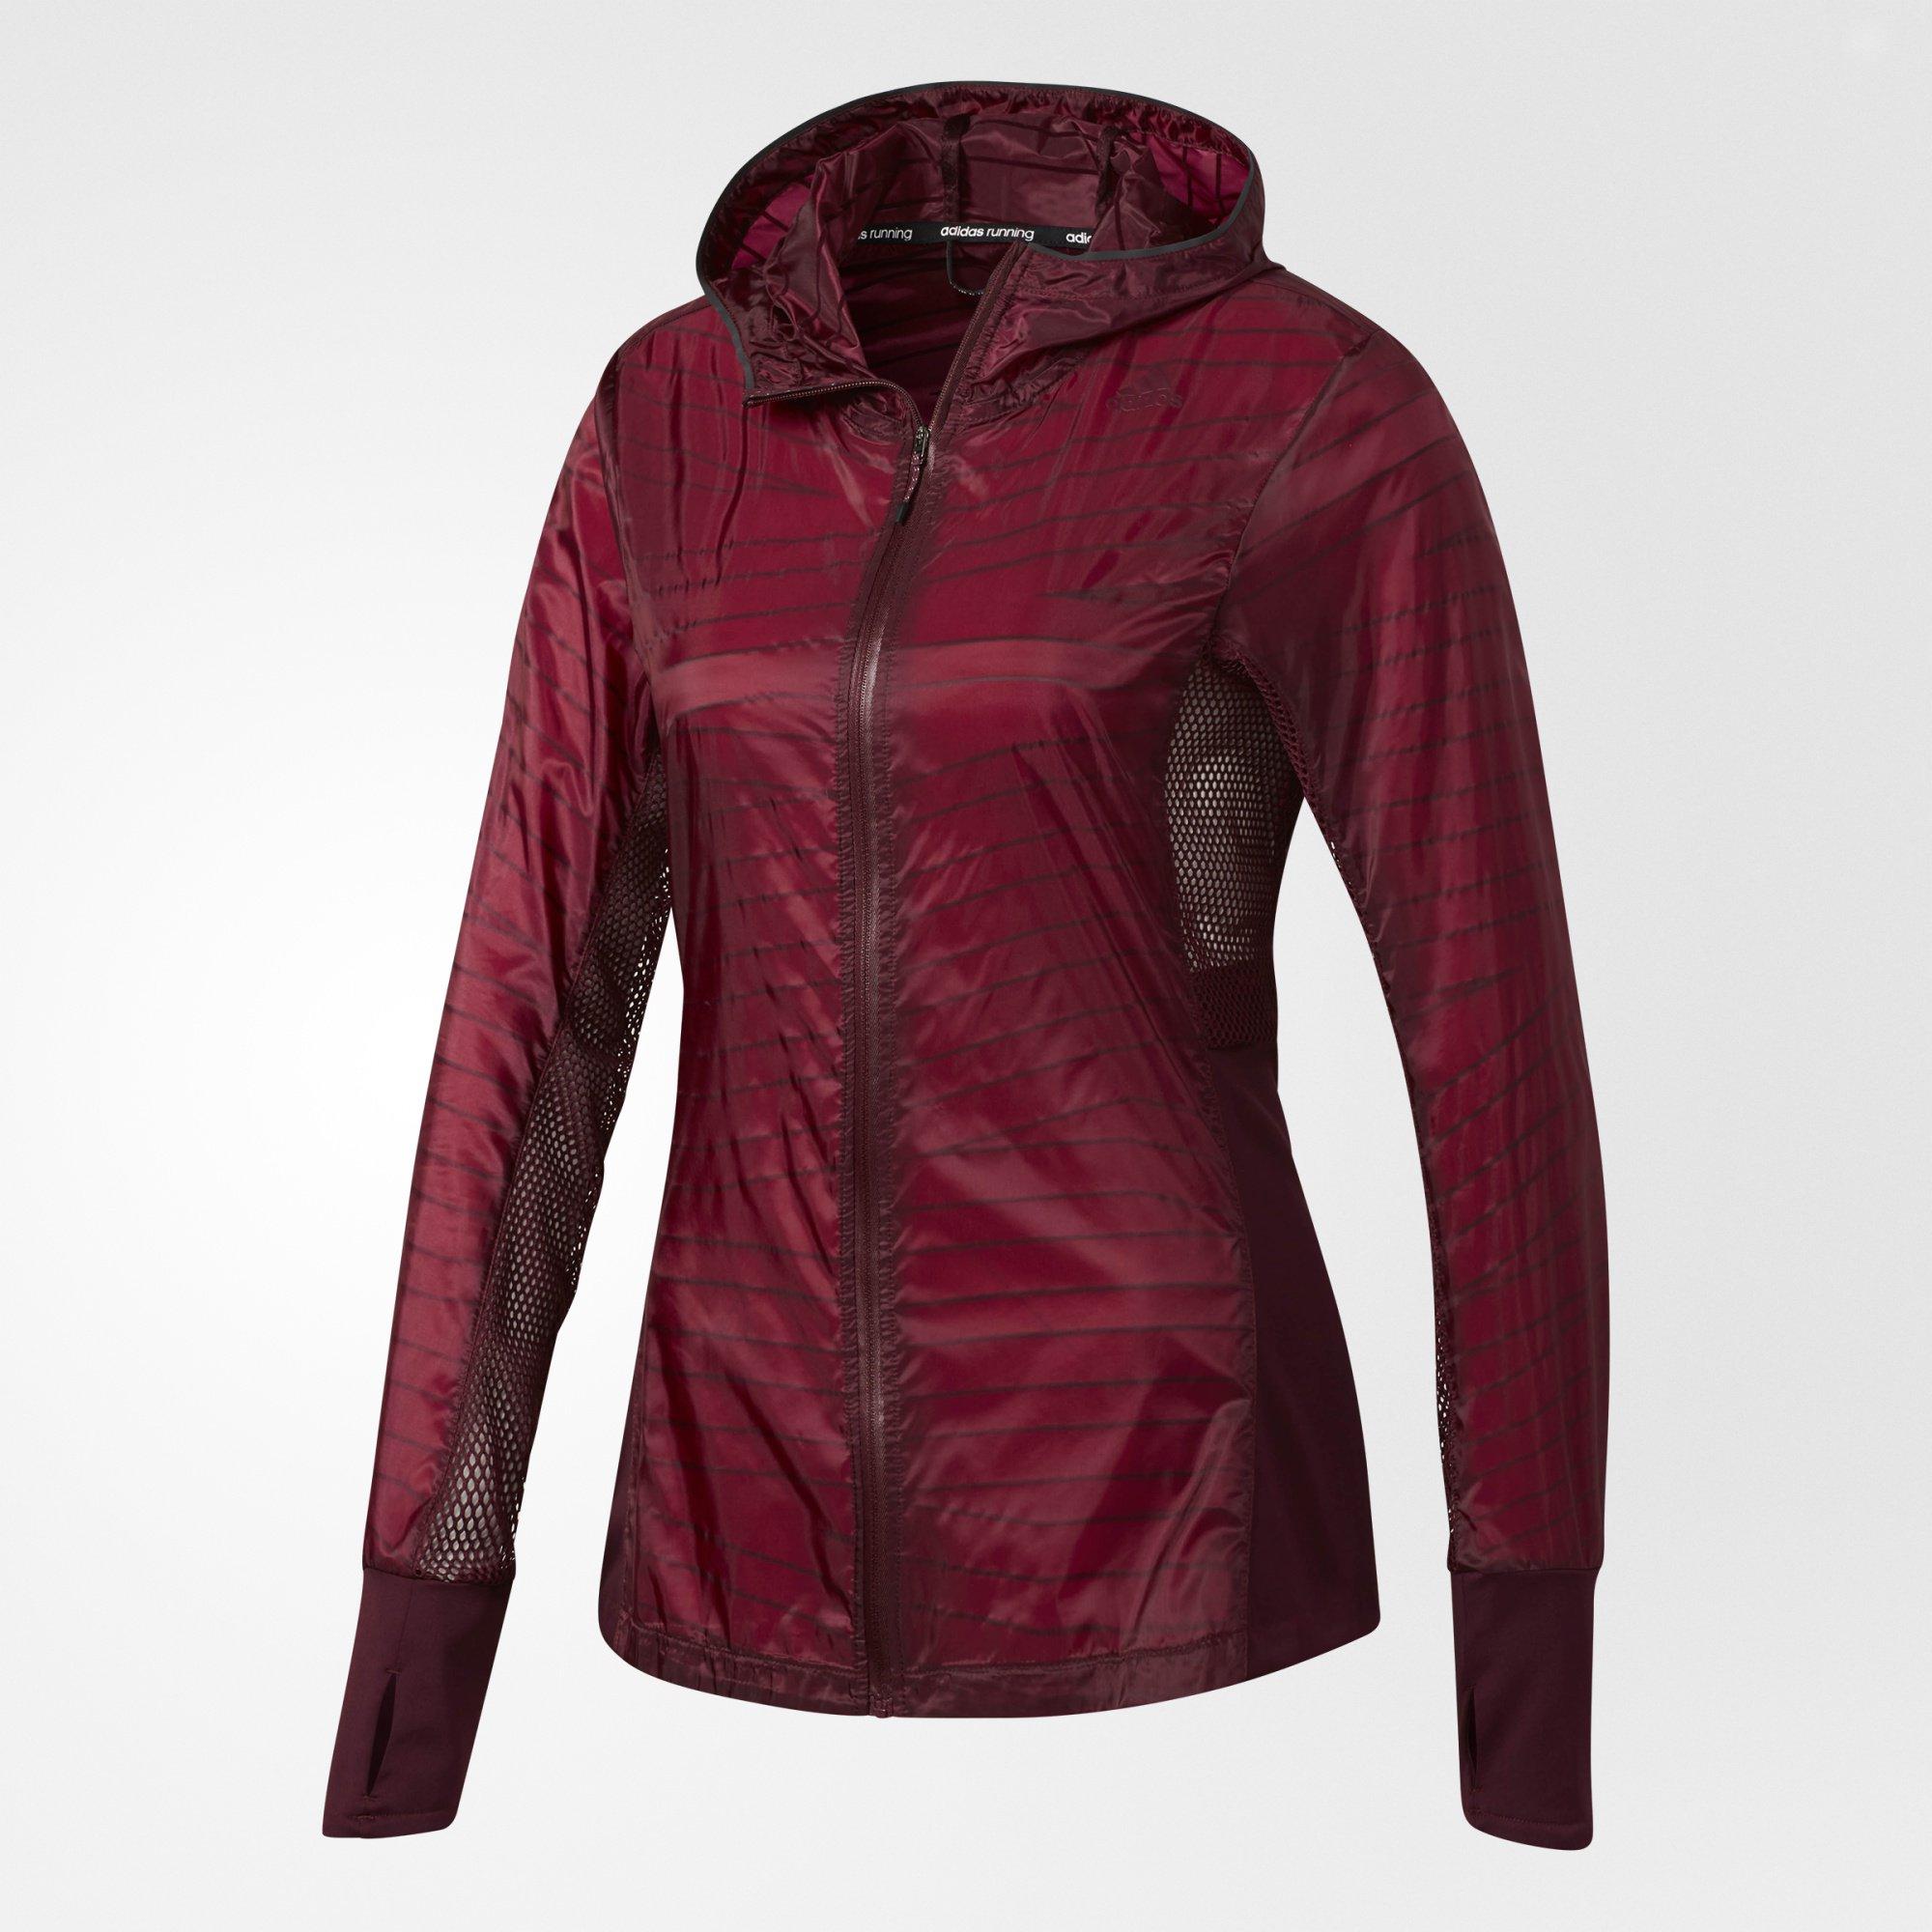 Женская куртка Adidas Supernova Tko B28261 38 RU